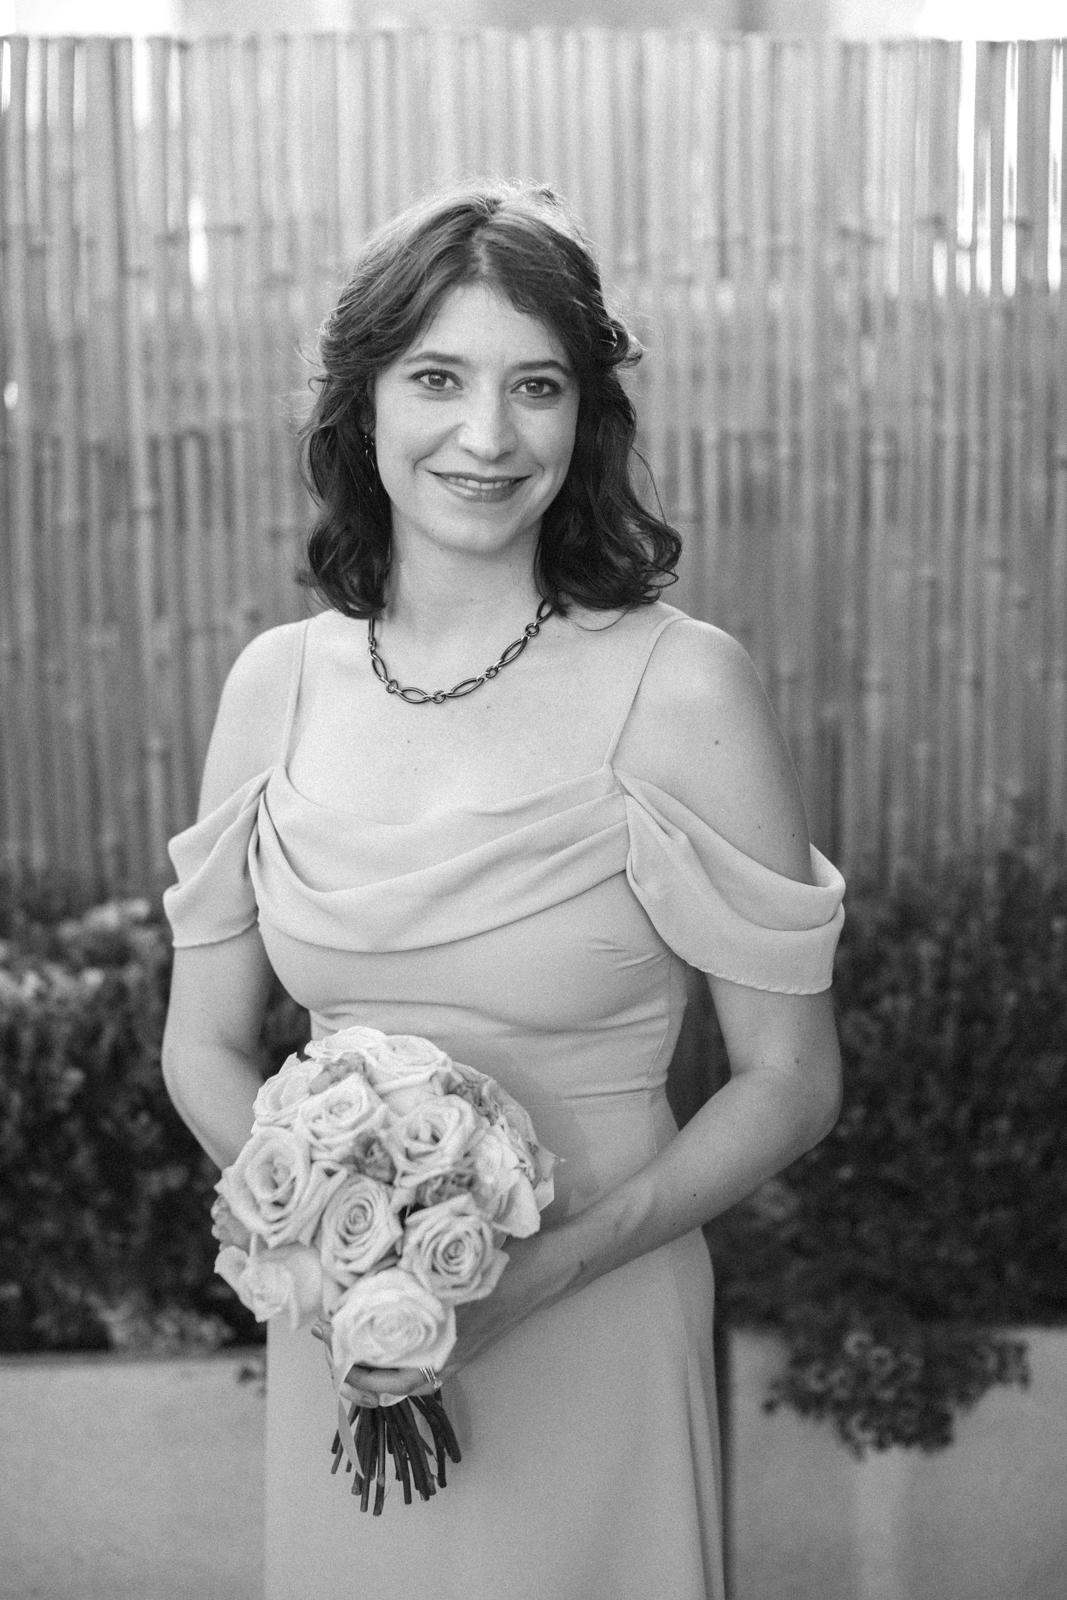 NYC Wedding Photography Sofitel Central Park Brooklyn Photographer Boris Zaretsky _B2C2792.jpg